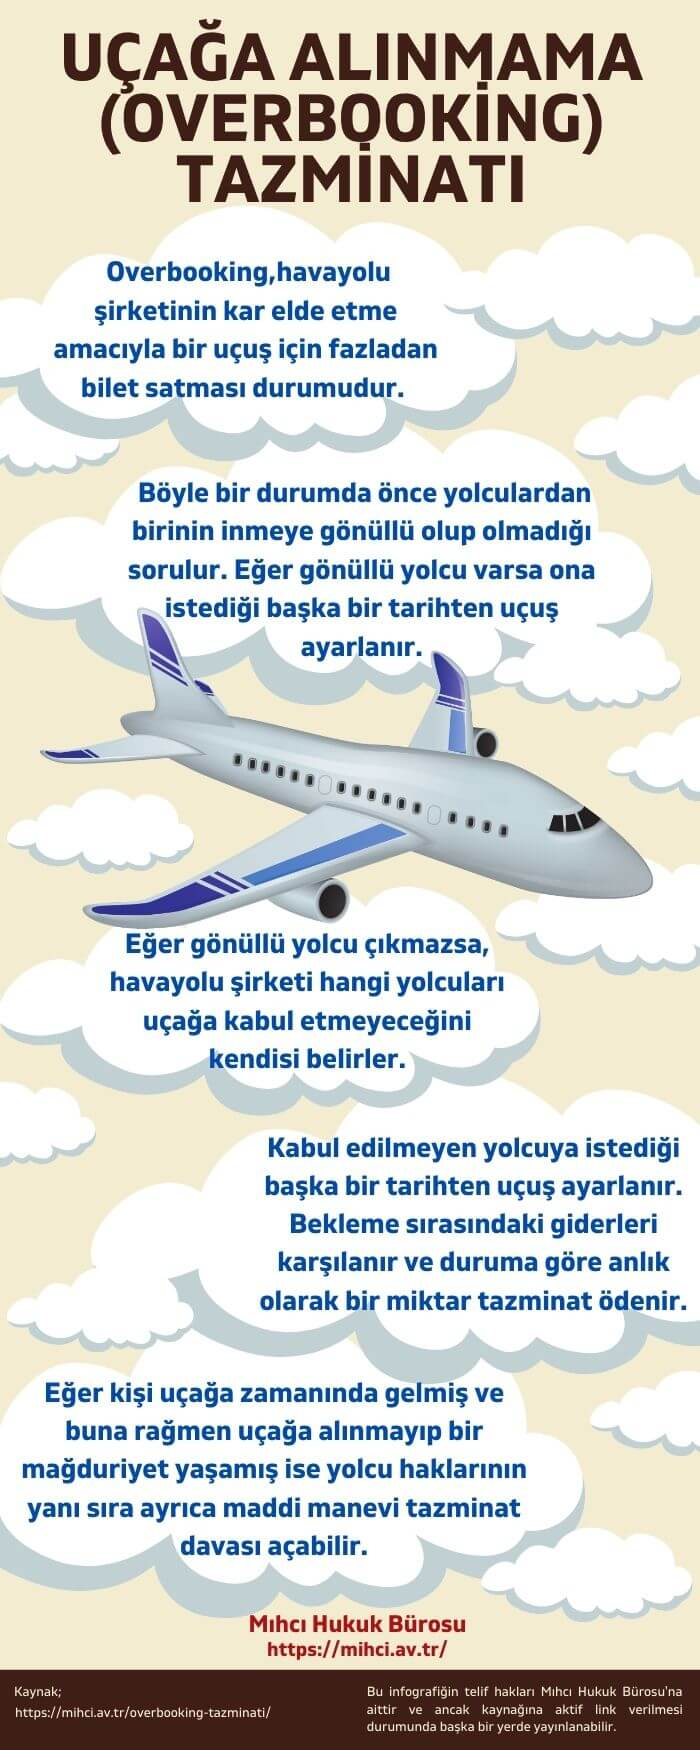 uçağa alınmama overbooking tazminatı infografik